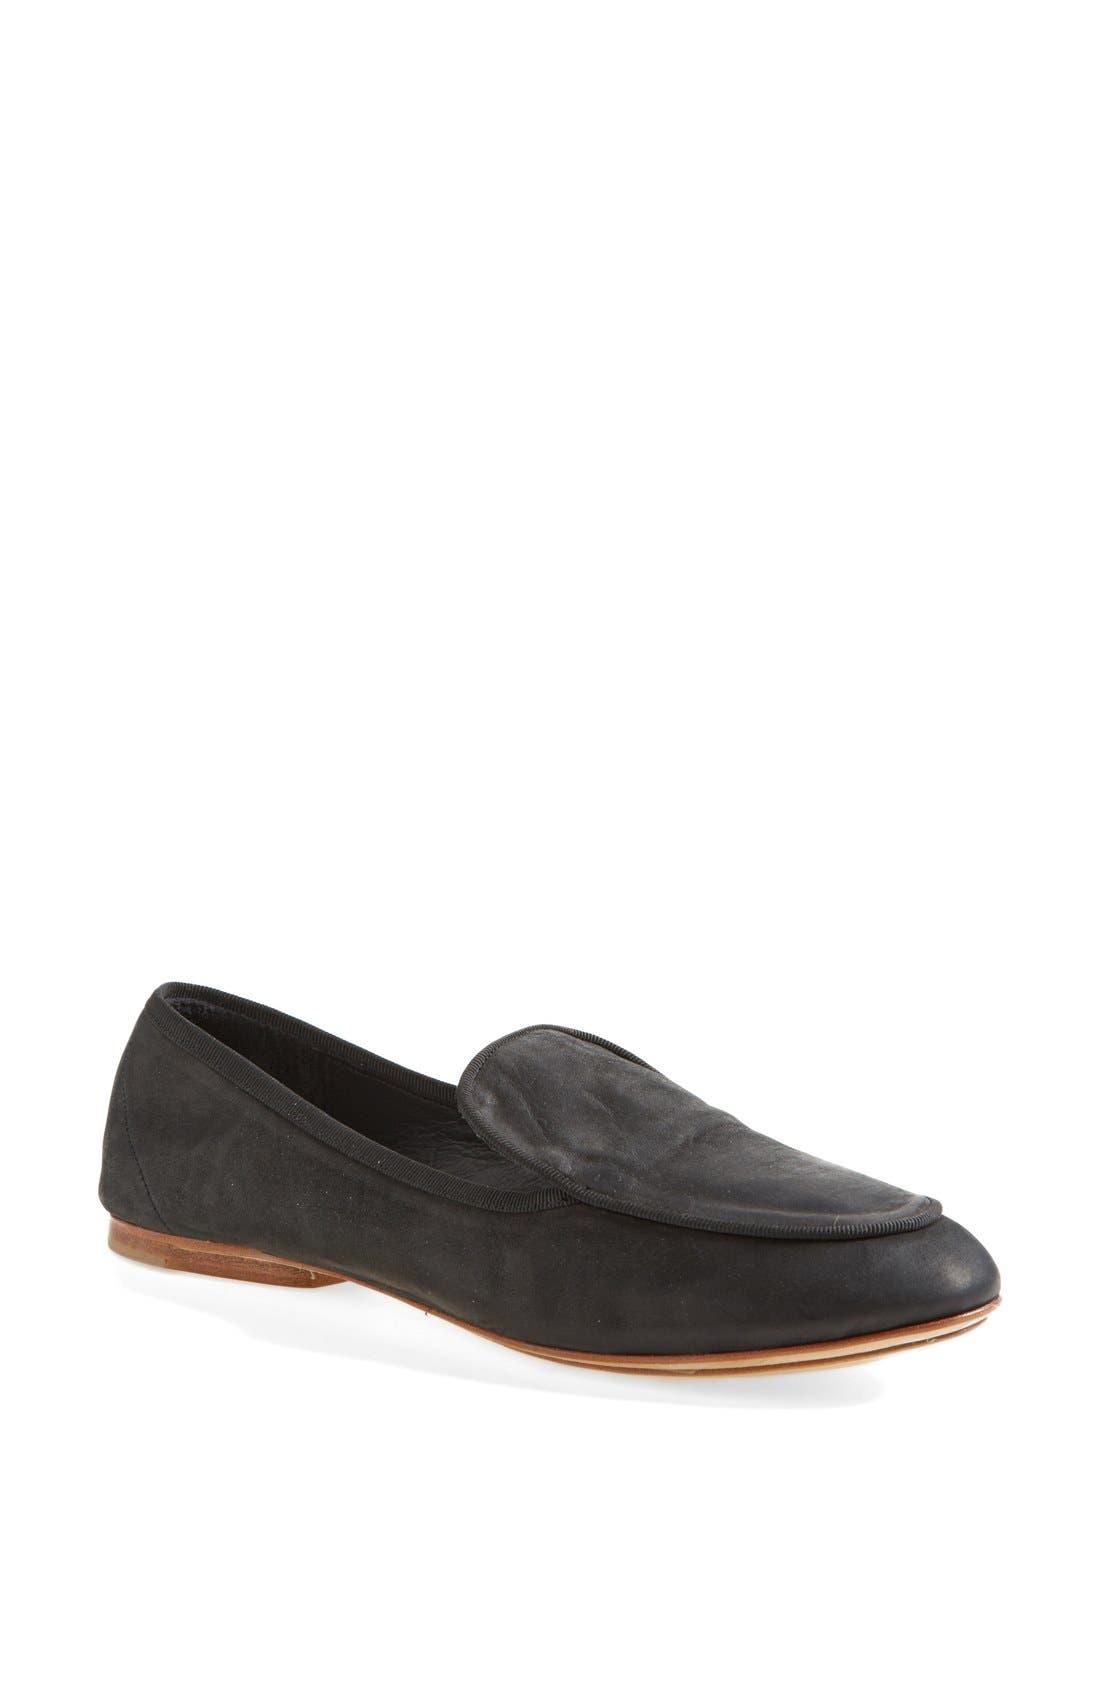 Alternate Image 1 Selected - rag & bone 'Beeman' Loafer Flat